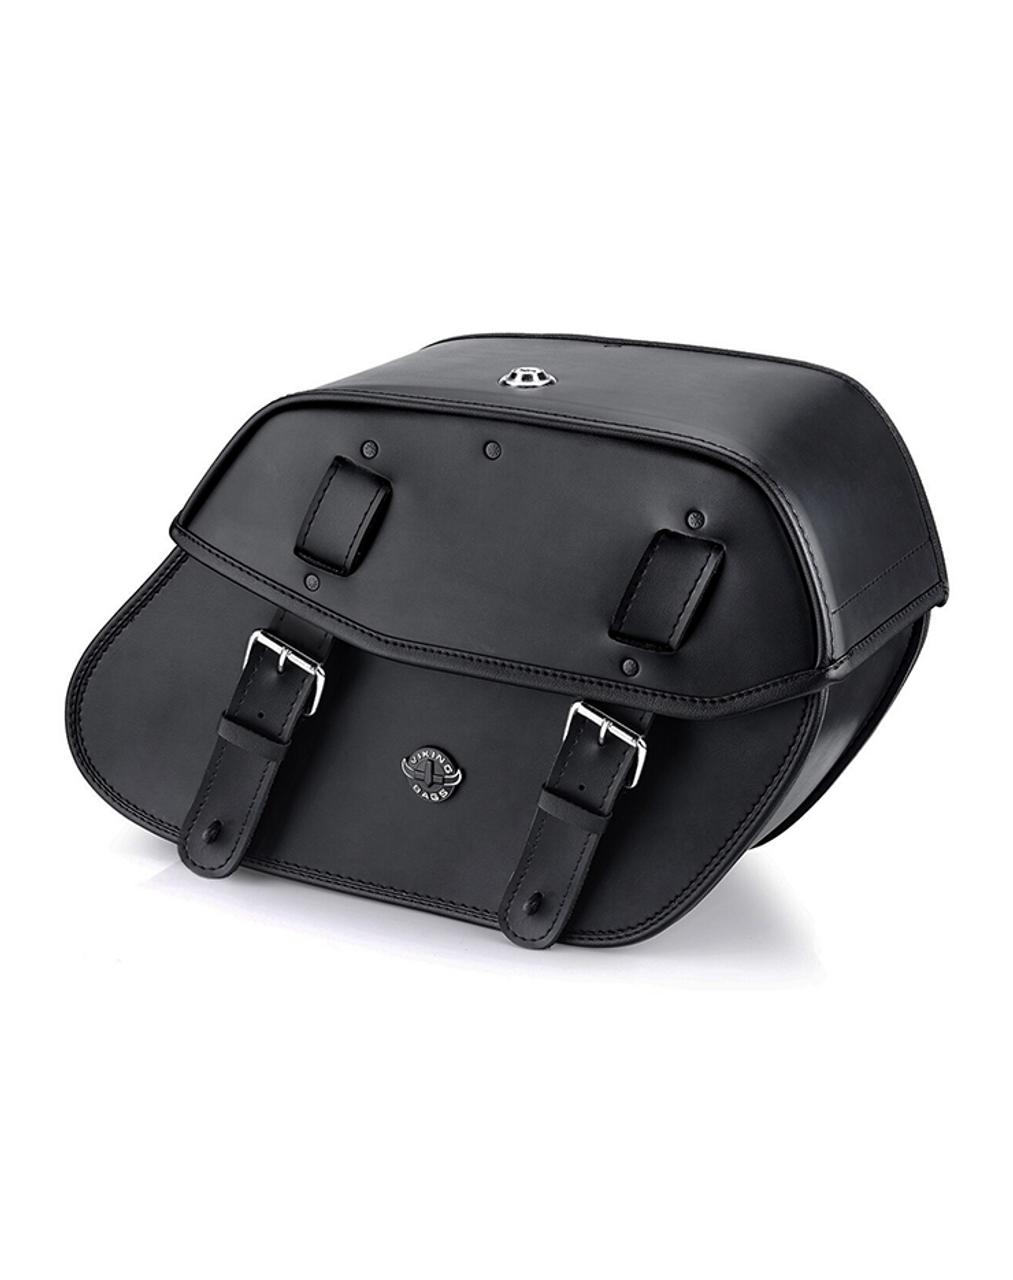 Viking Odin Medium Motorcycle Saddlebags For Harley Softail Standard FXST Bag View